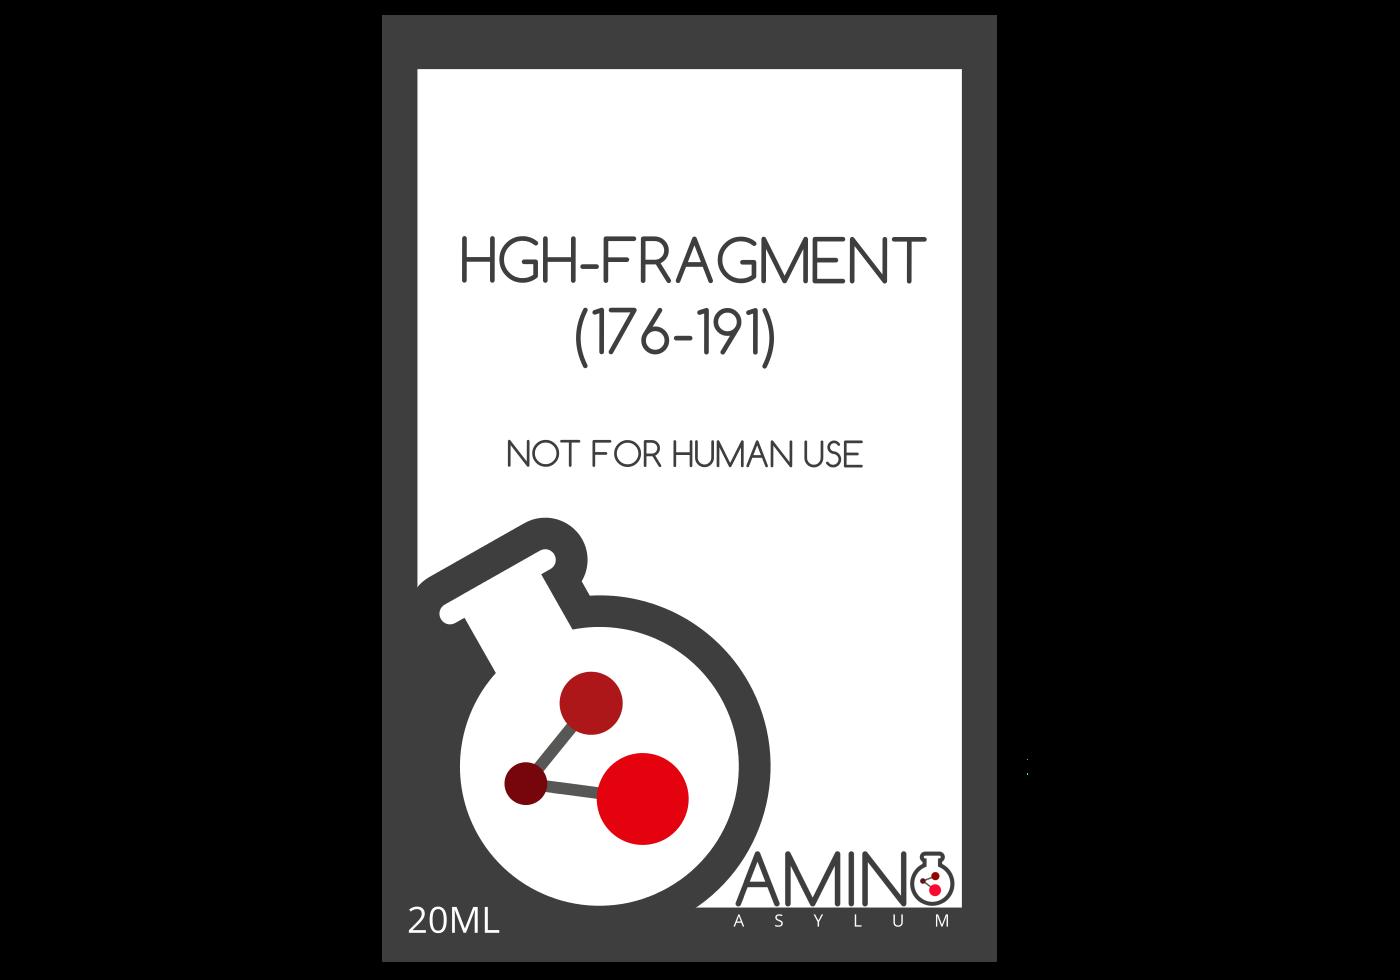 HGH-FRAGMENT(176-191) 2MG